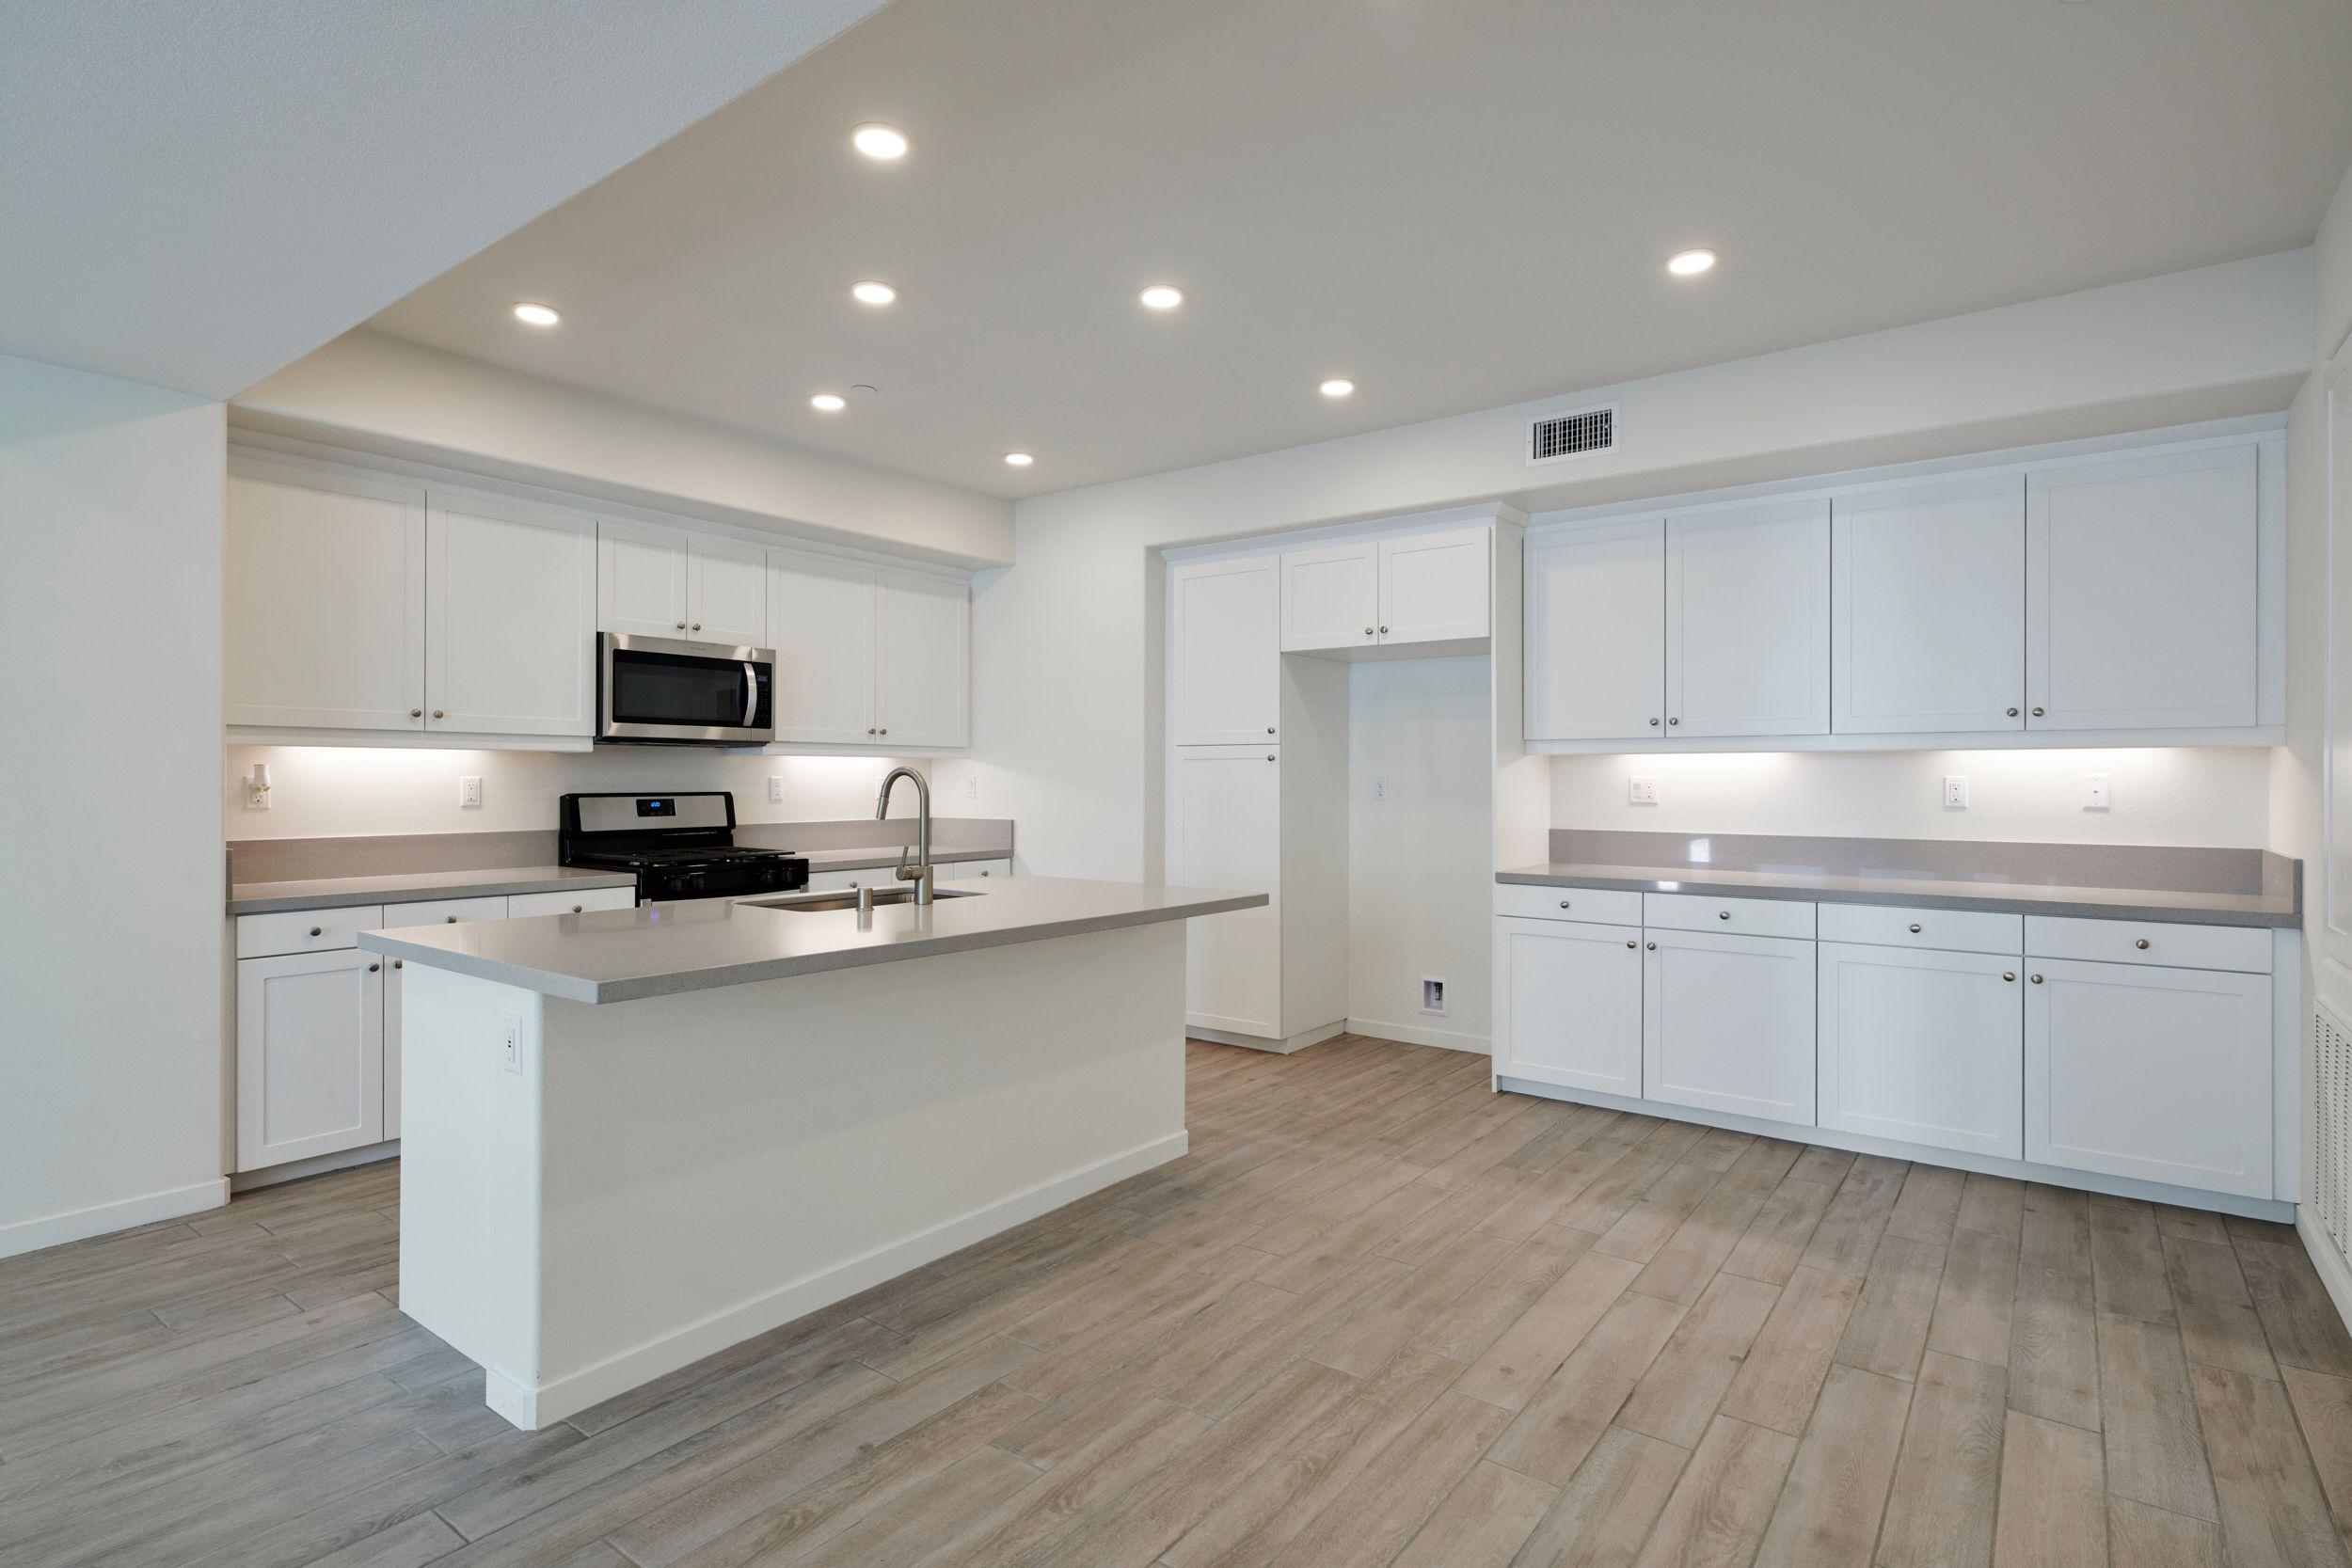 Kitchen featured in the Residence 2 By Van Daele Homes in Riverside-San Bernardino, CA